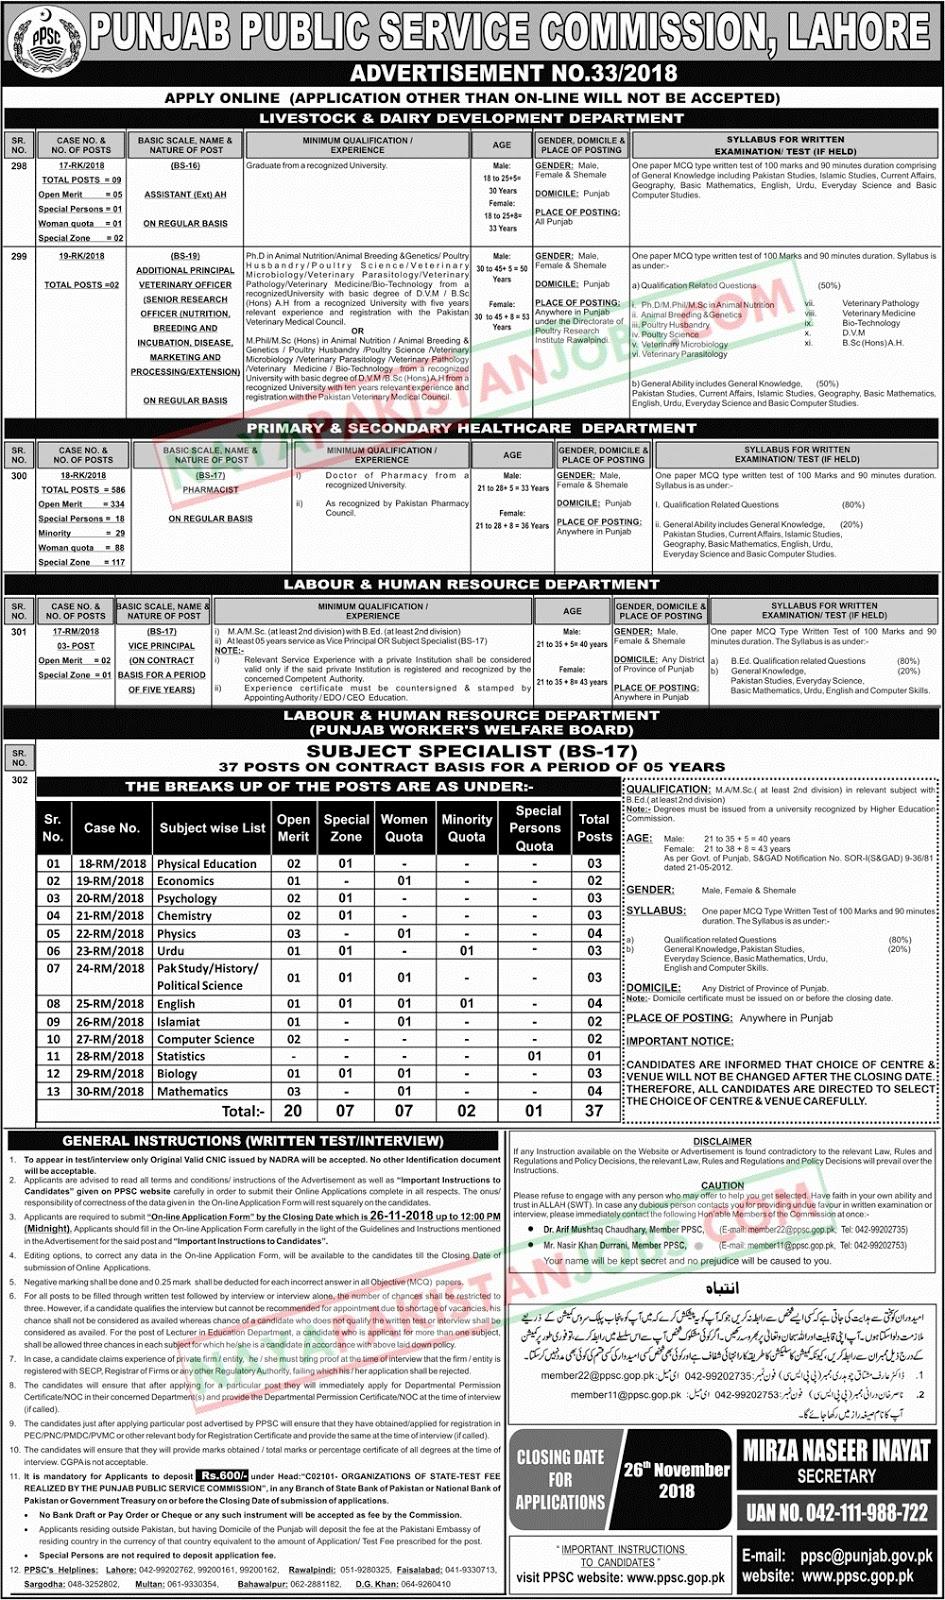 PPSC Jobs Ad No 33, ppsc latest Jobs , New Jobs ppsc Subject specialist Teachers